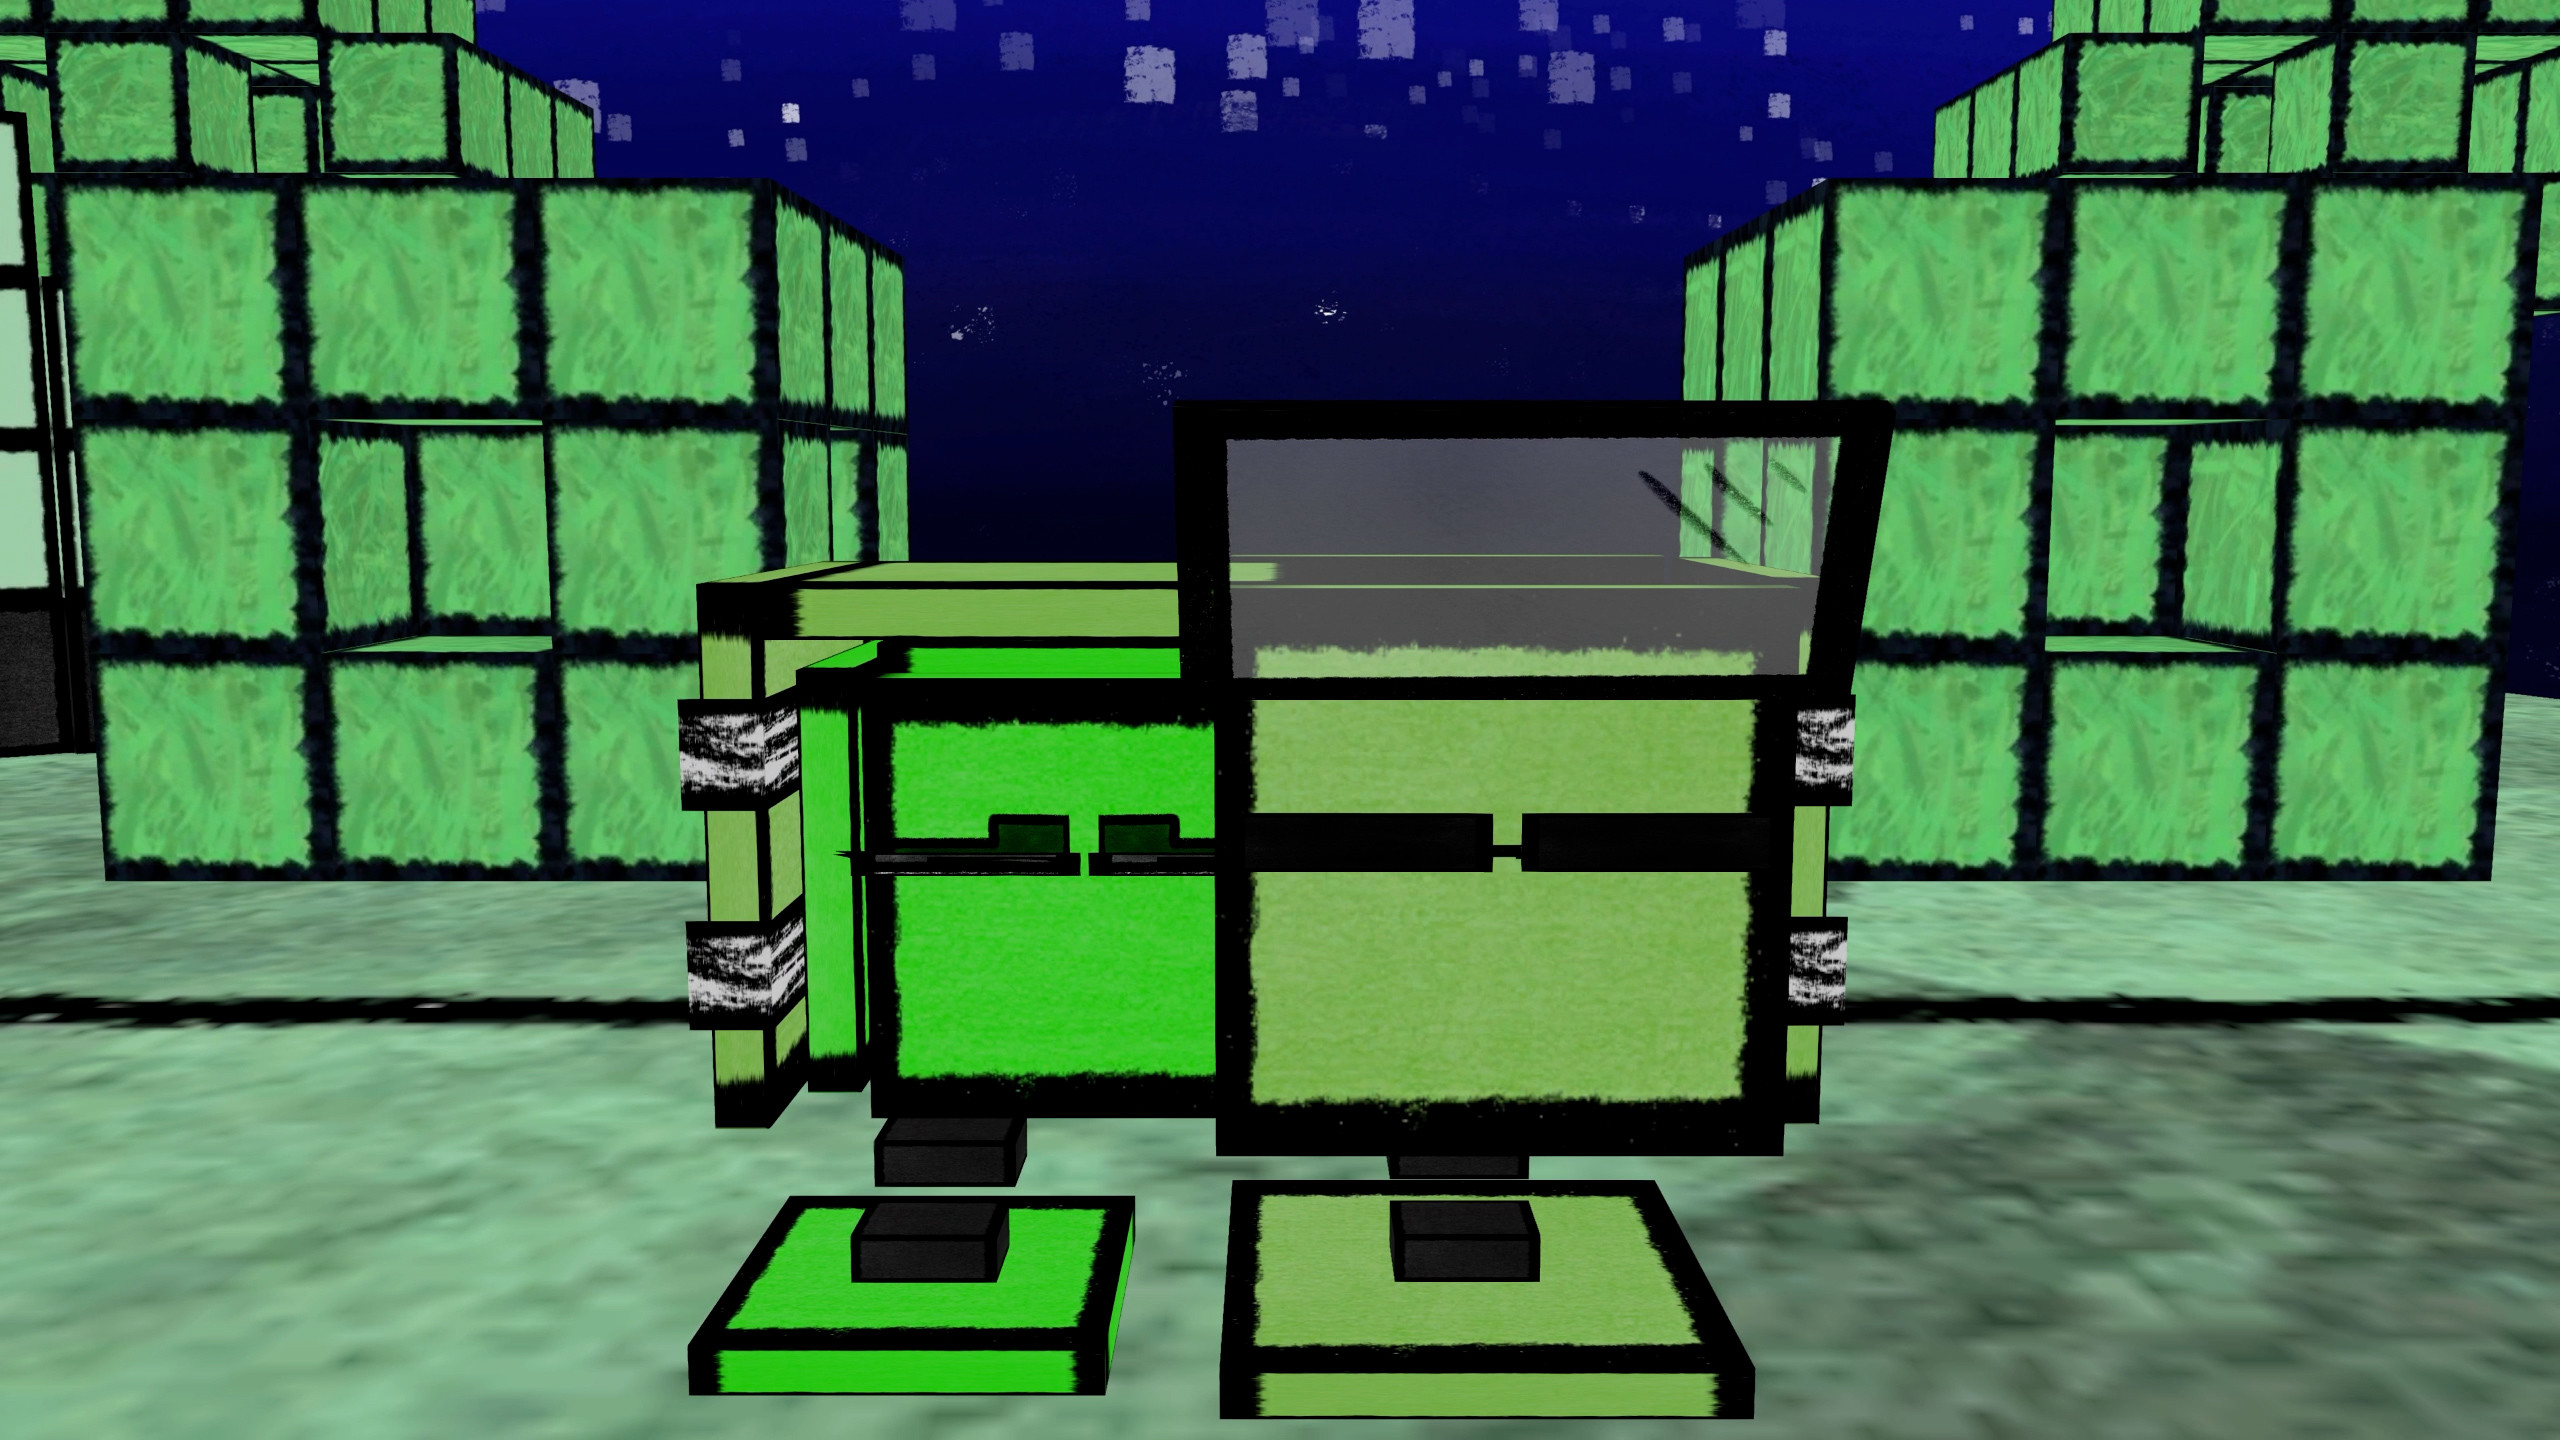 The Indestructible Moxy Boxy screenshot